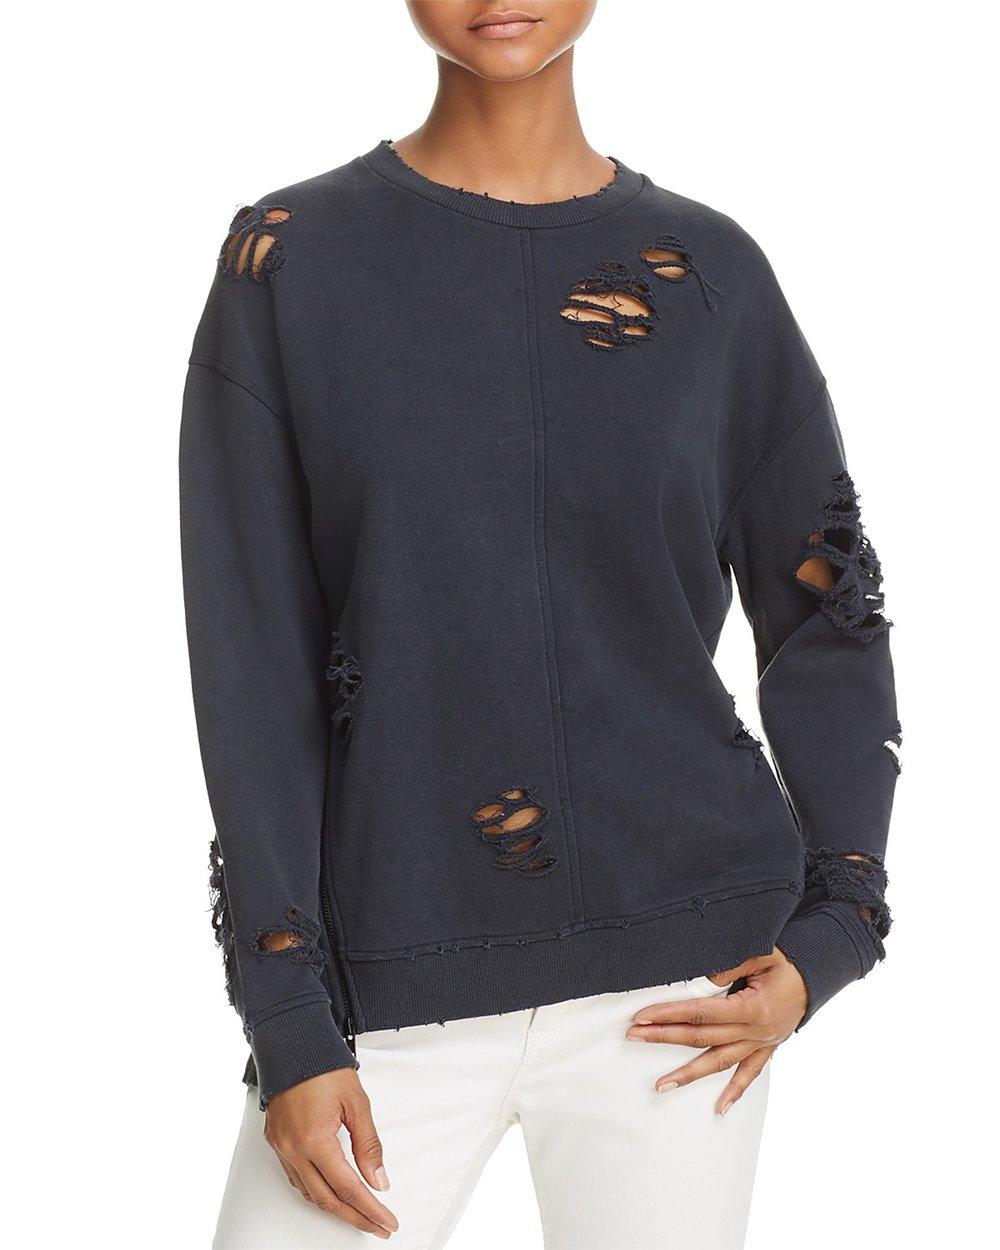 Joe's Jeans Lyndon Distressed Sweatshirt